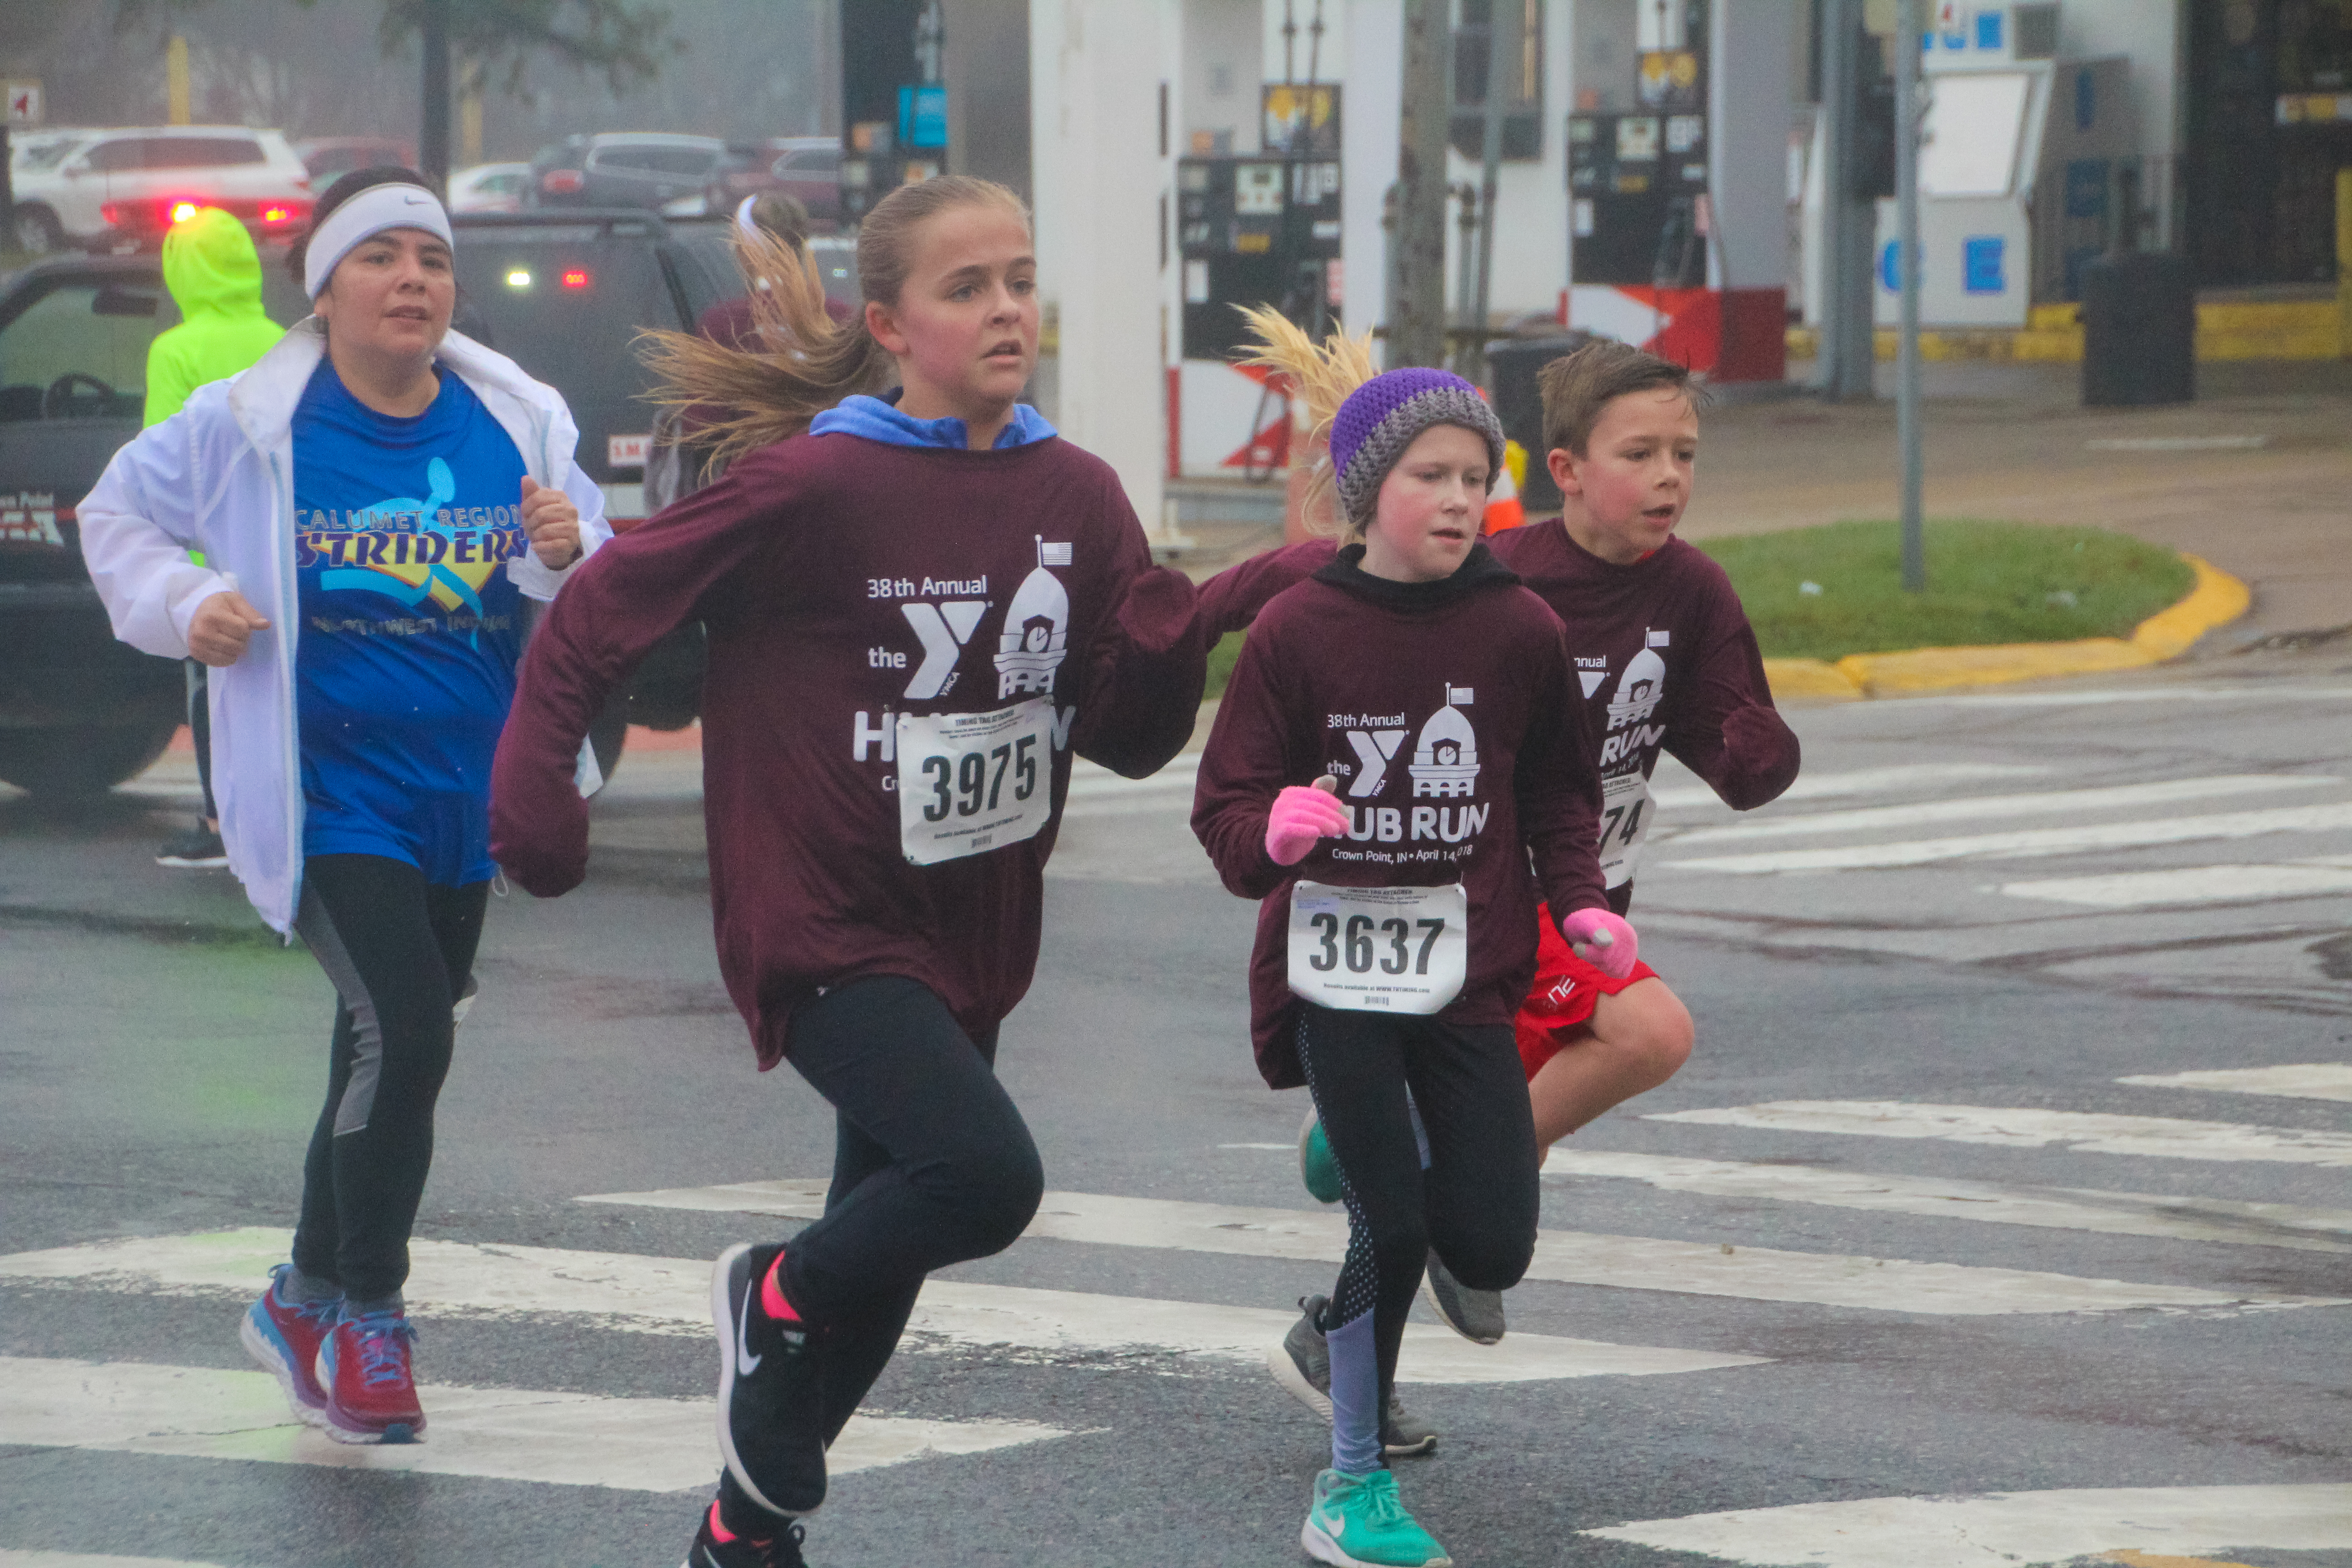 Hub Run Race 2018